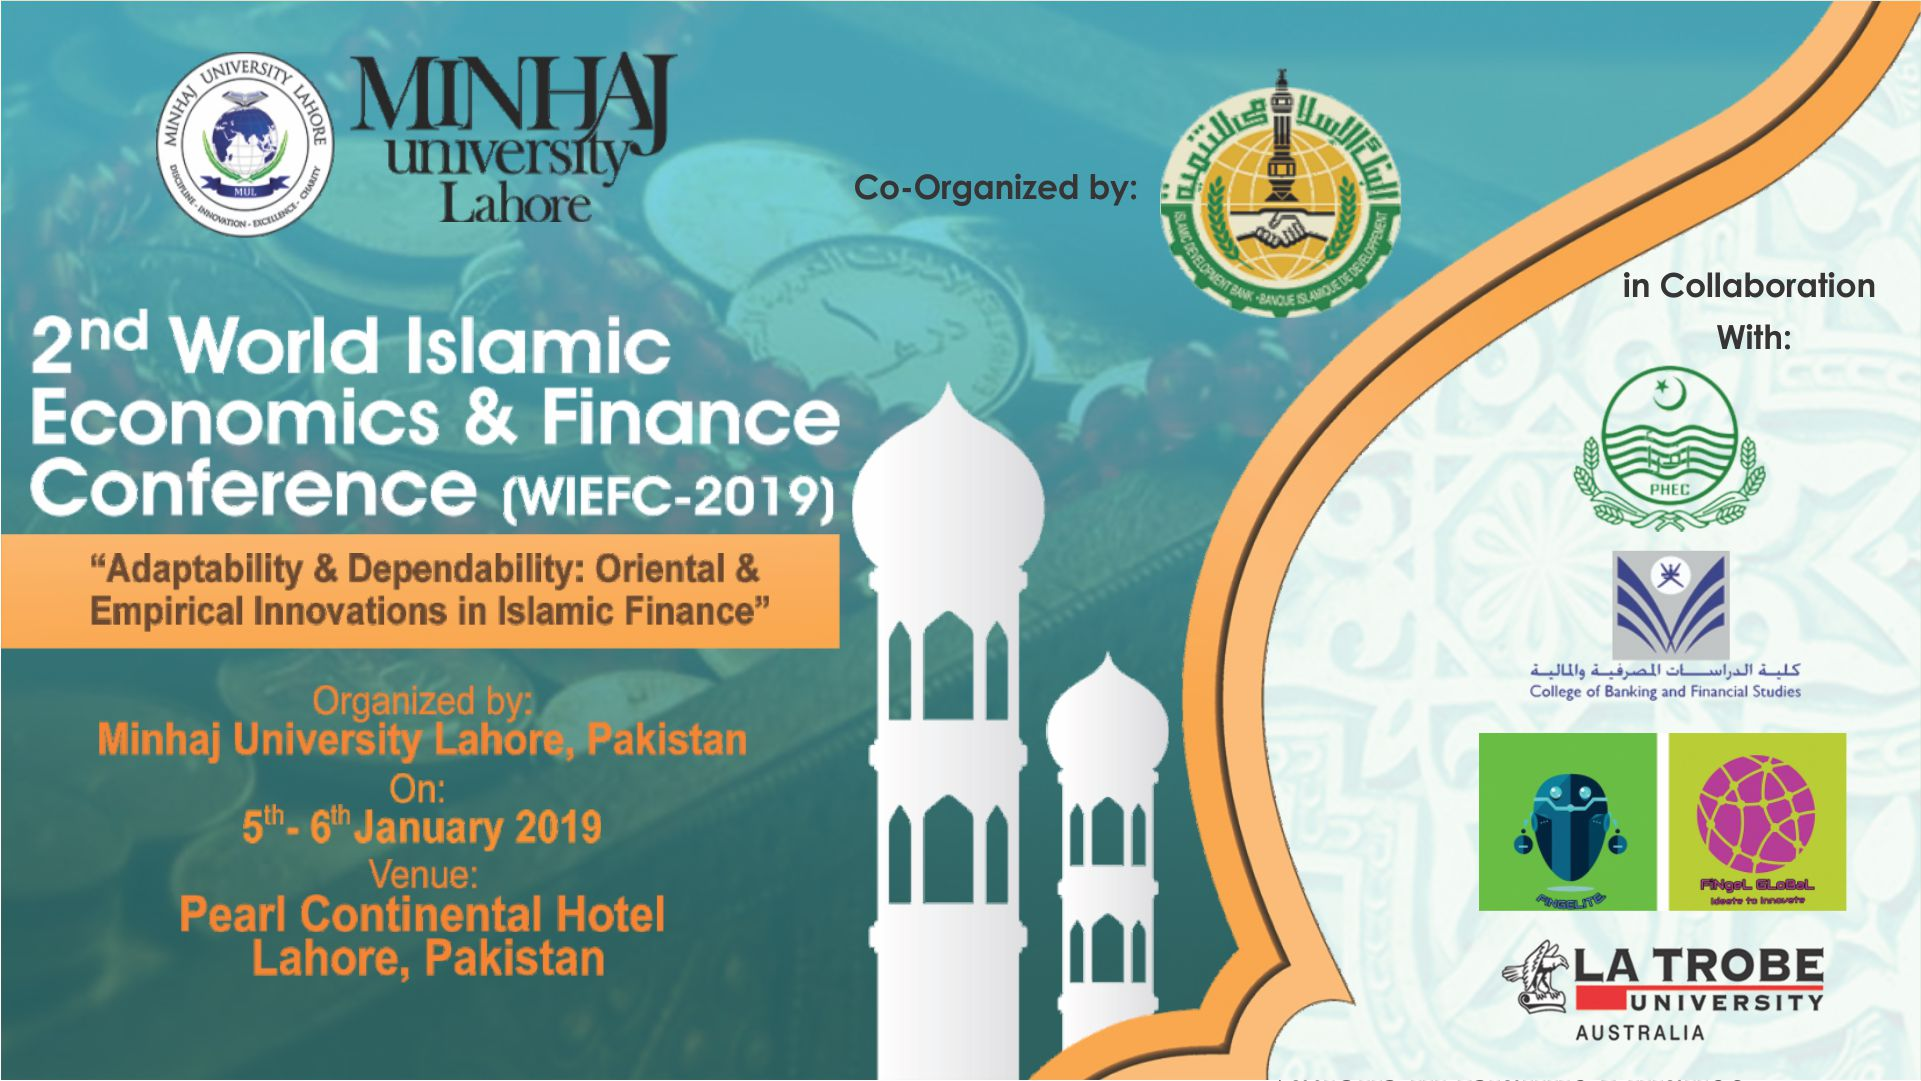 2nd World Islamic Economics & Finance Conference